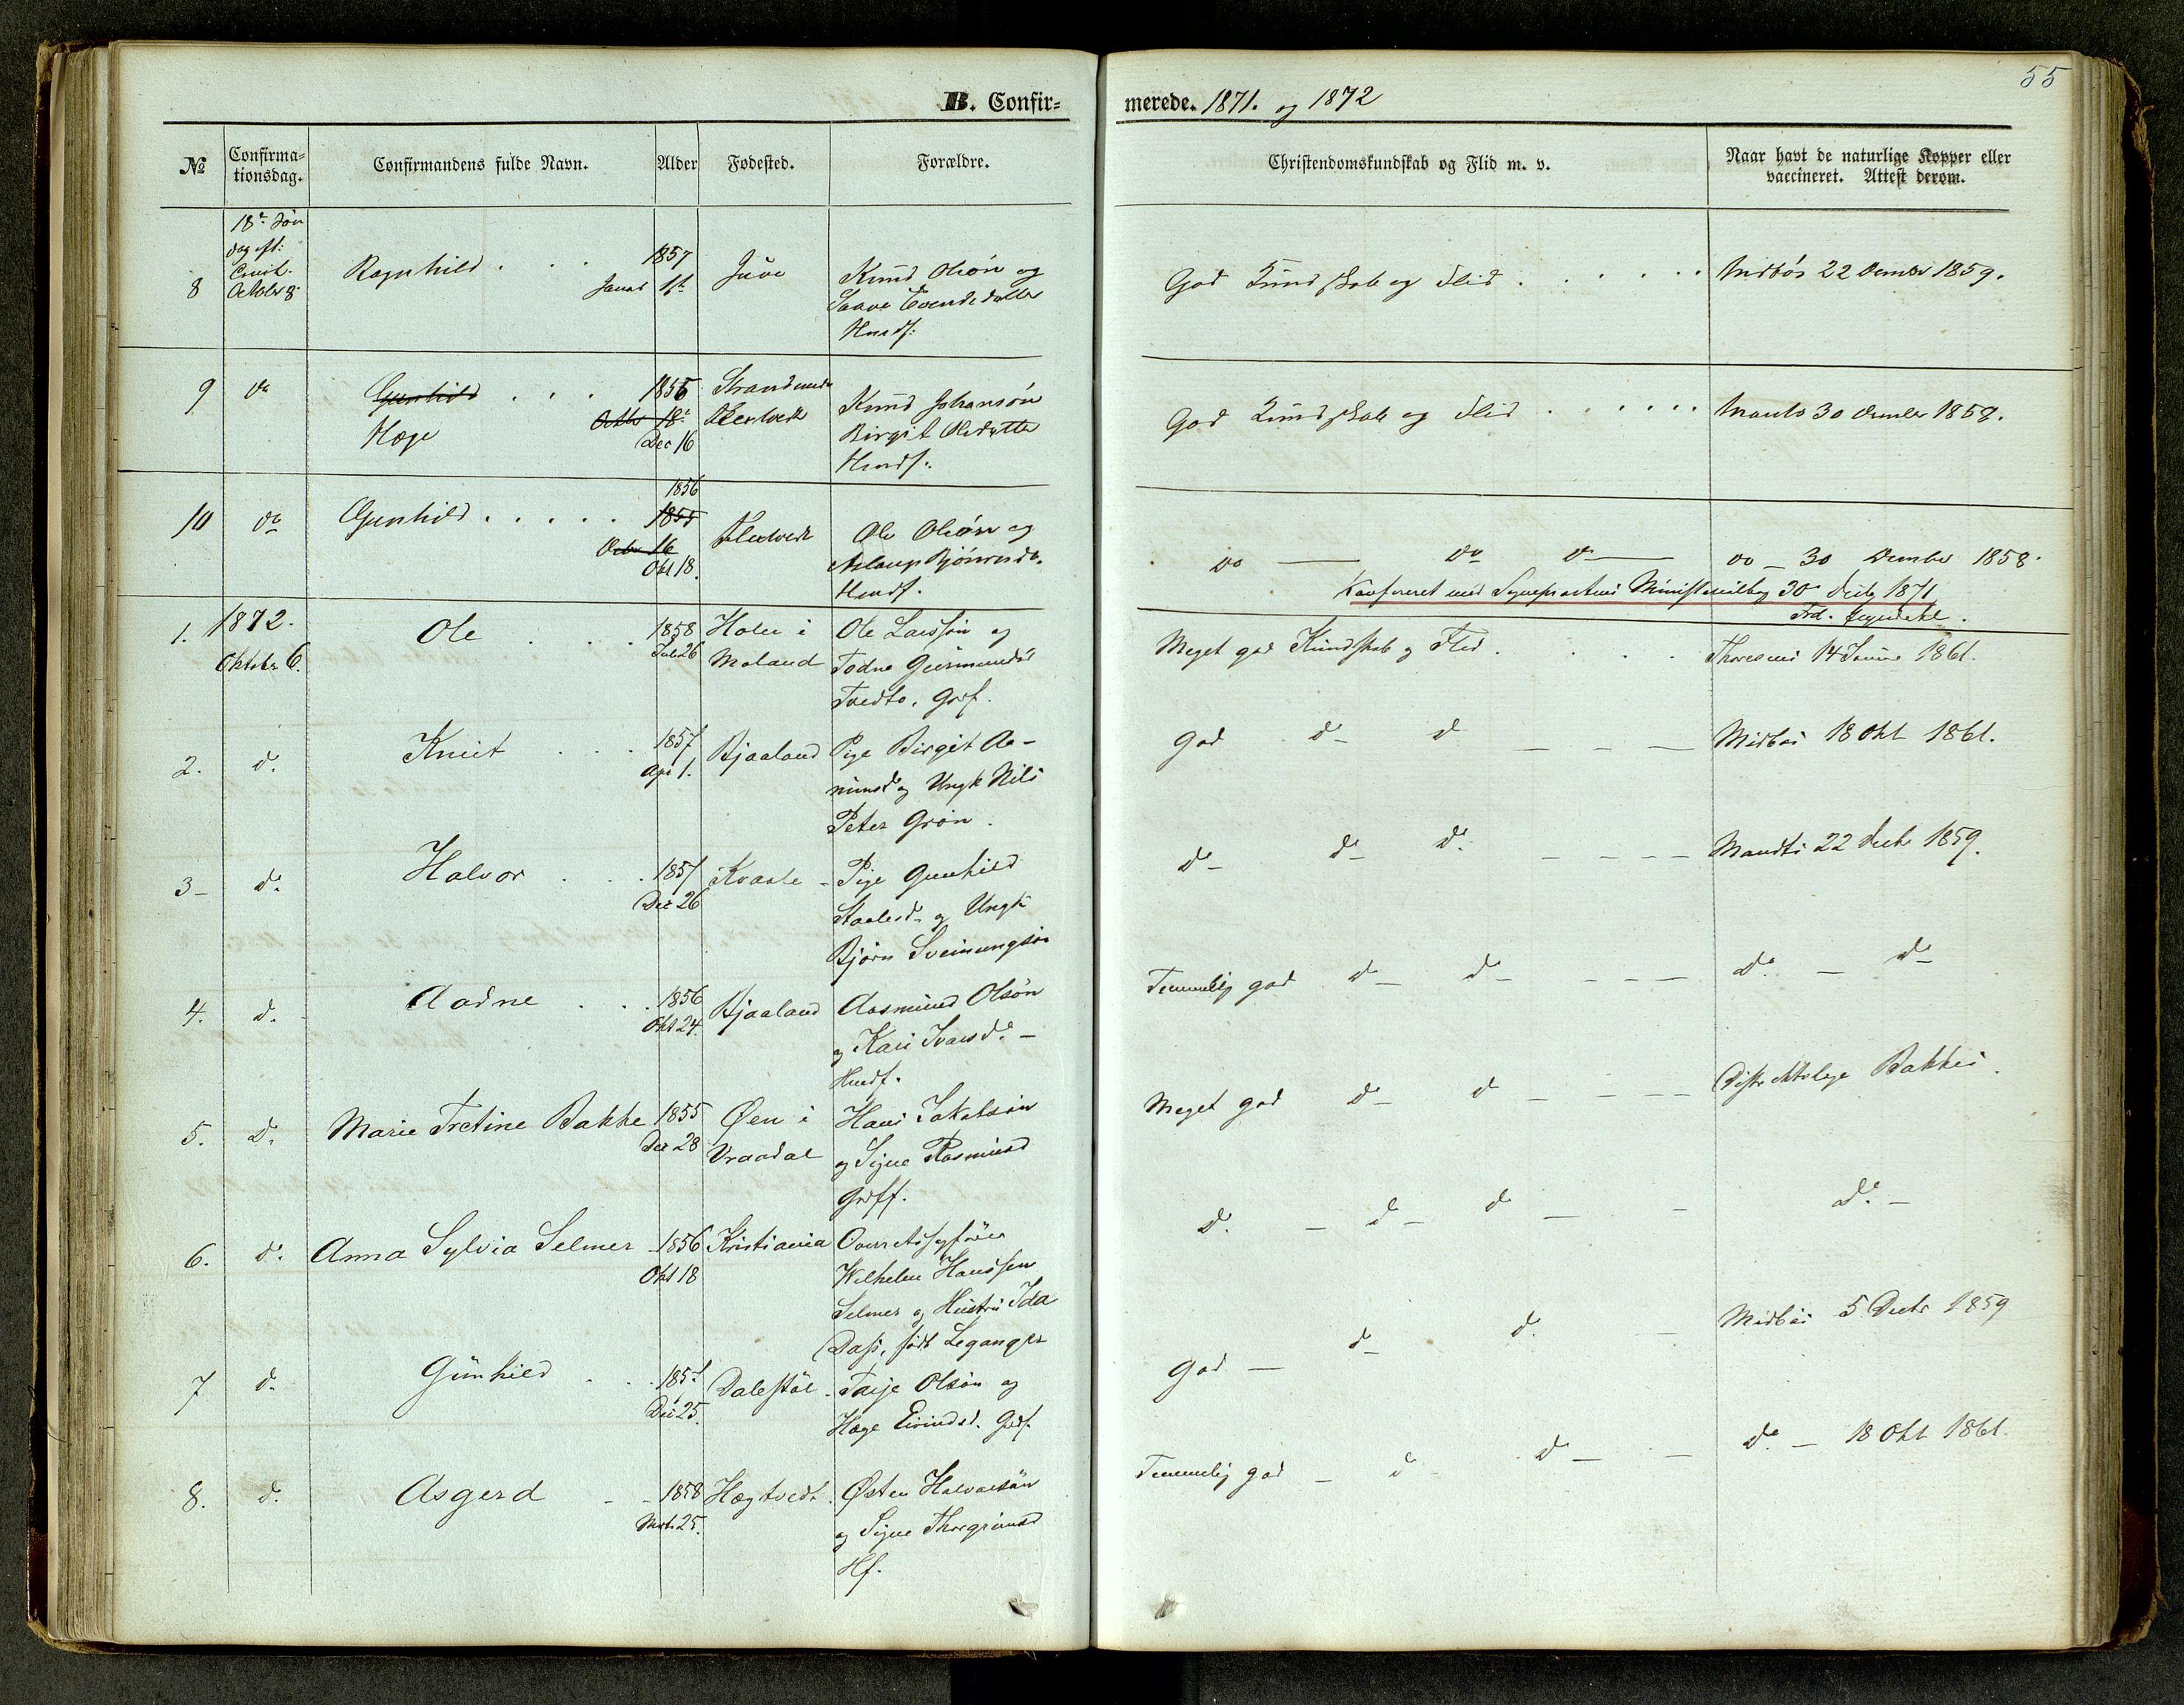 SAKO, Lårdal kirkebøker, G/Ga/L0002: Klokkerbok nr. I 2, 1861-1890, s. 55